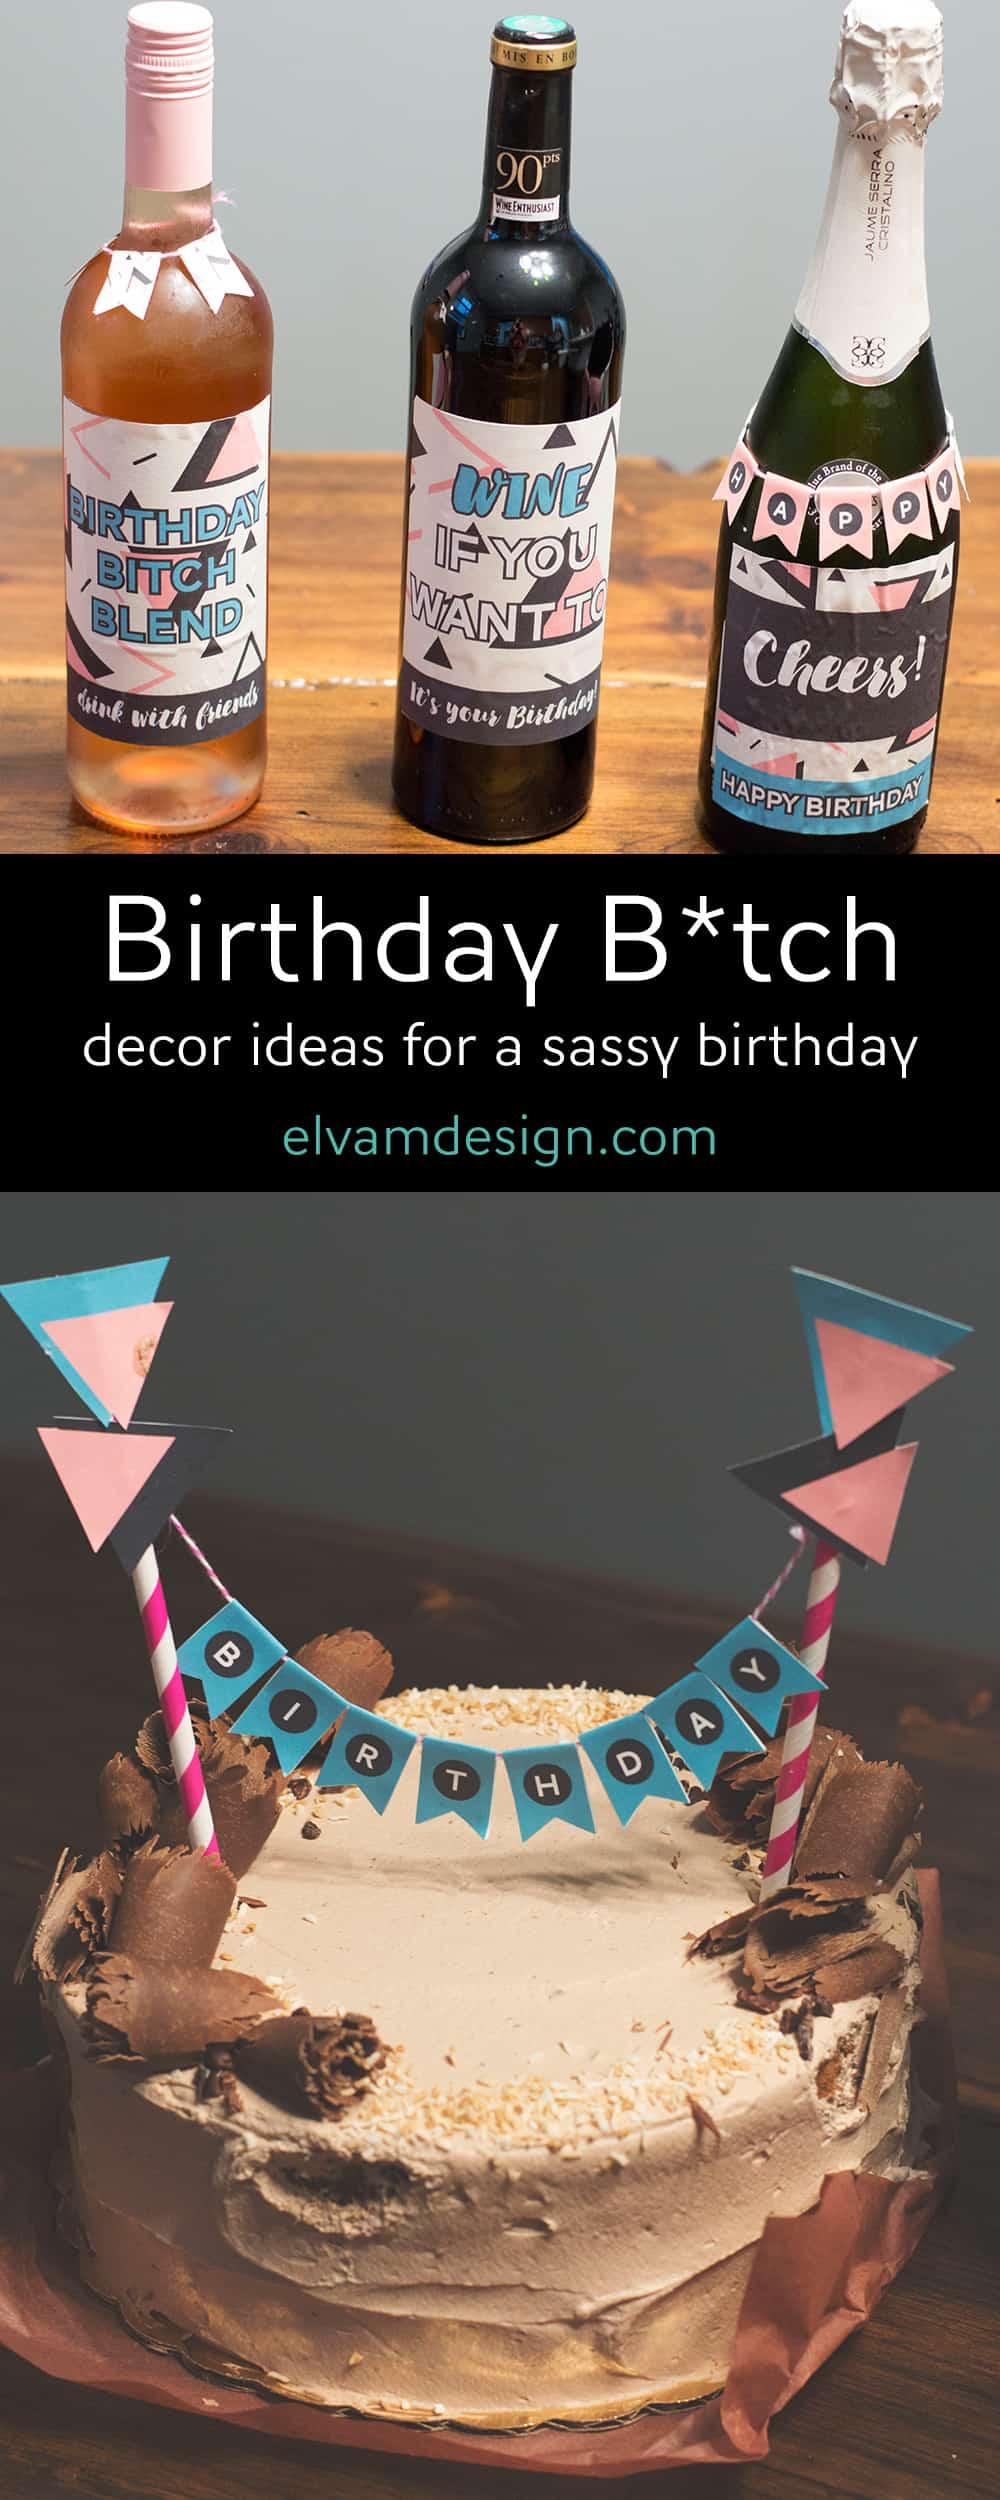 Birthday B*tch! Decor ideas for a sassy birthday from Elva M Design Studio